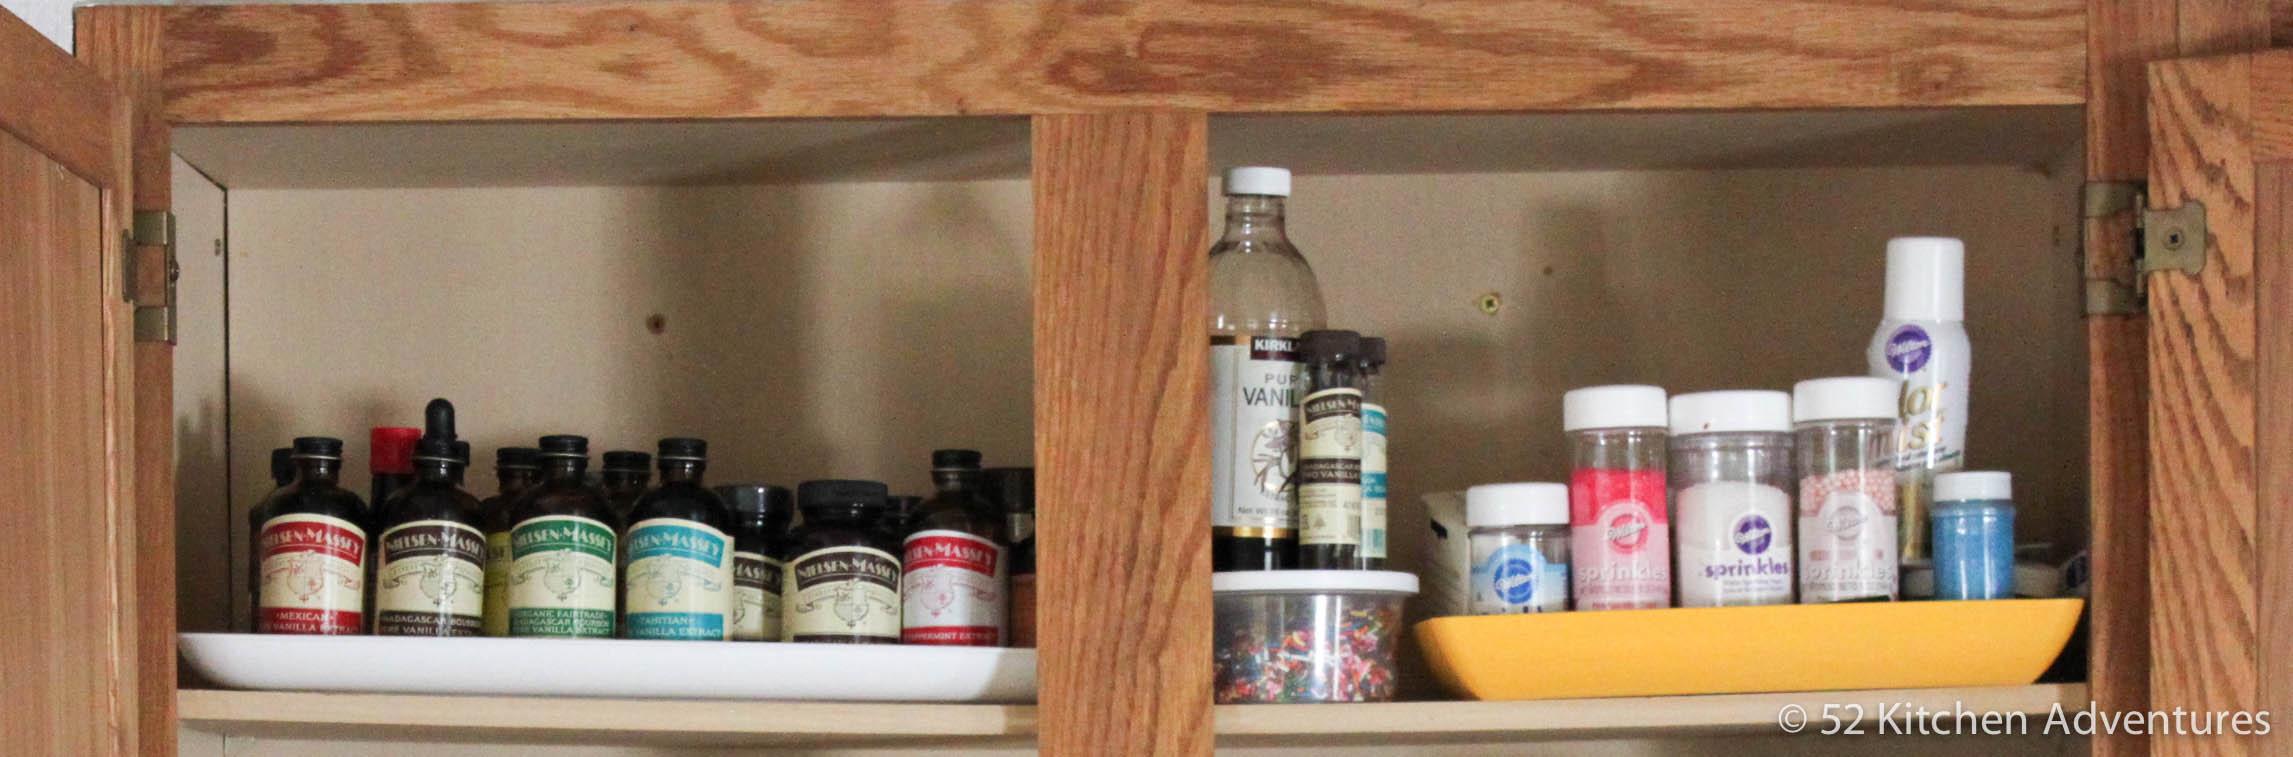 Use trays to organize baking supplies